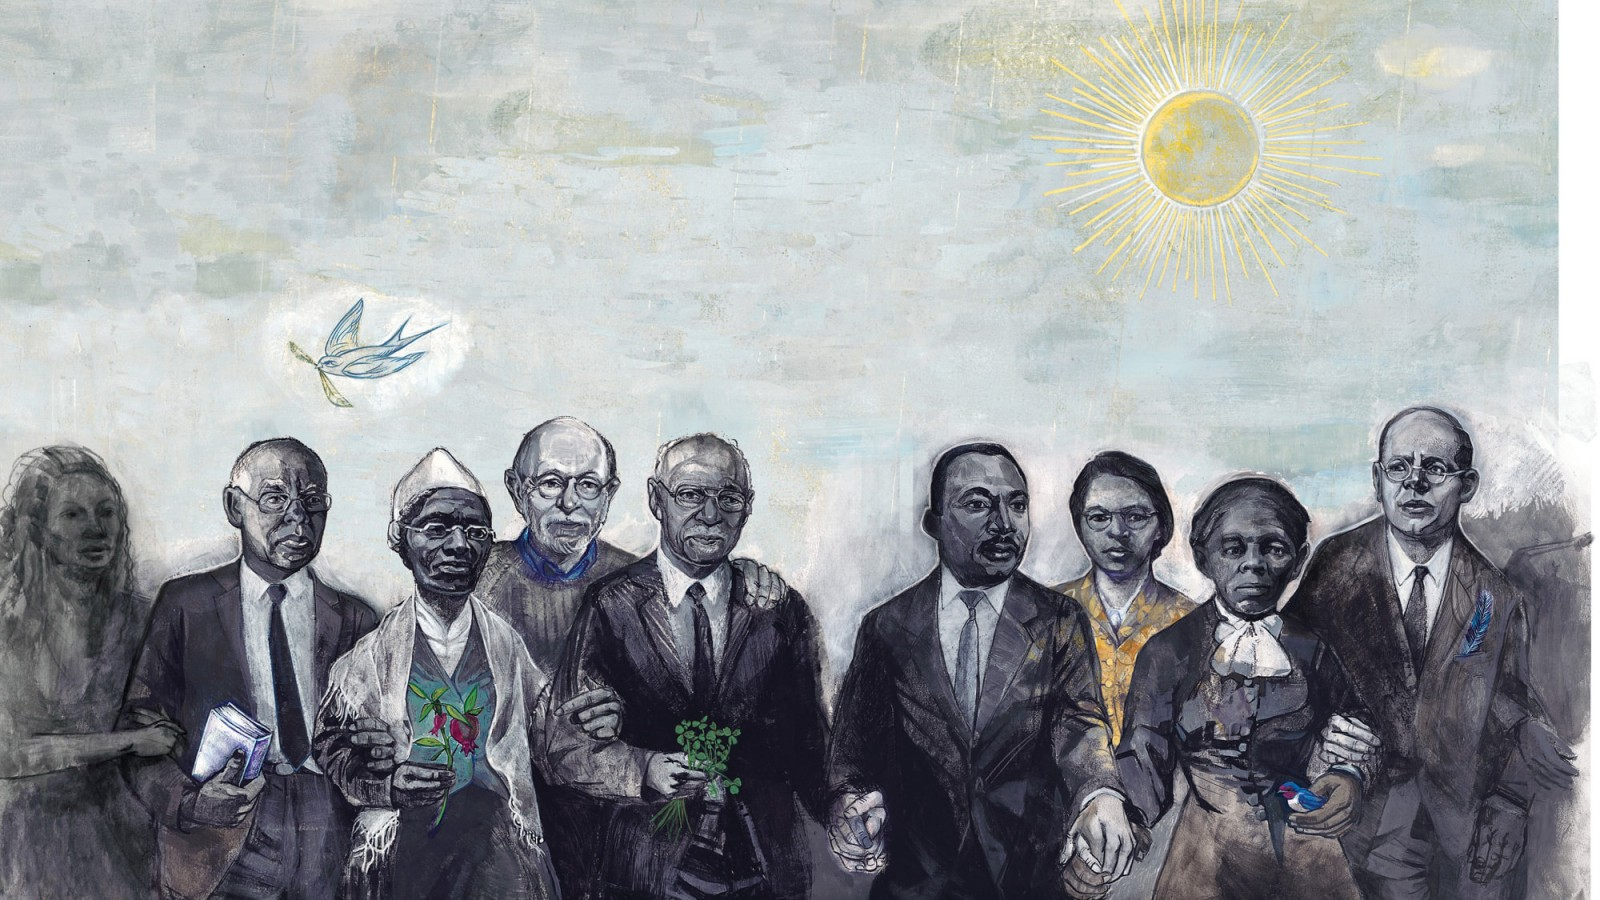 Illustration of marching advocates by Denise Louise Klitsie for FULLER magazine